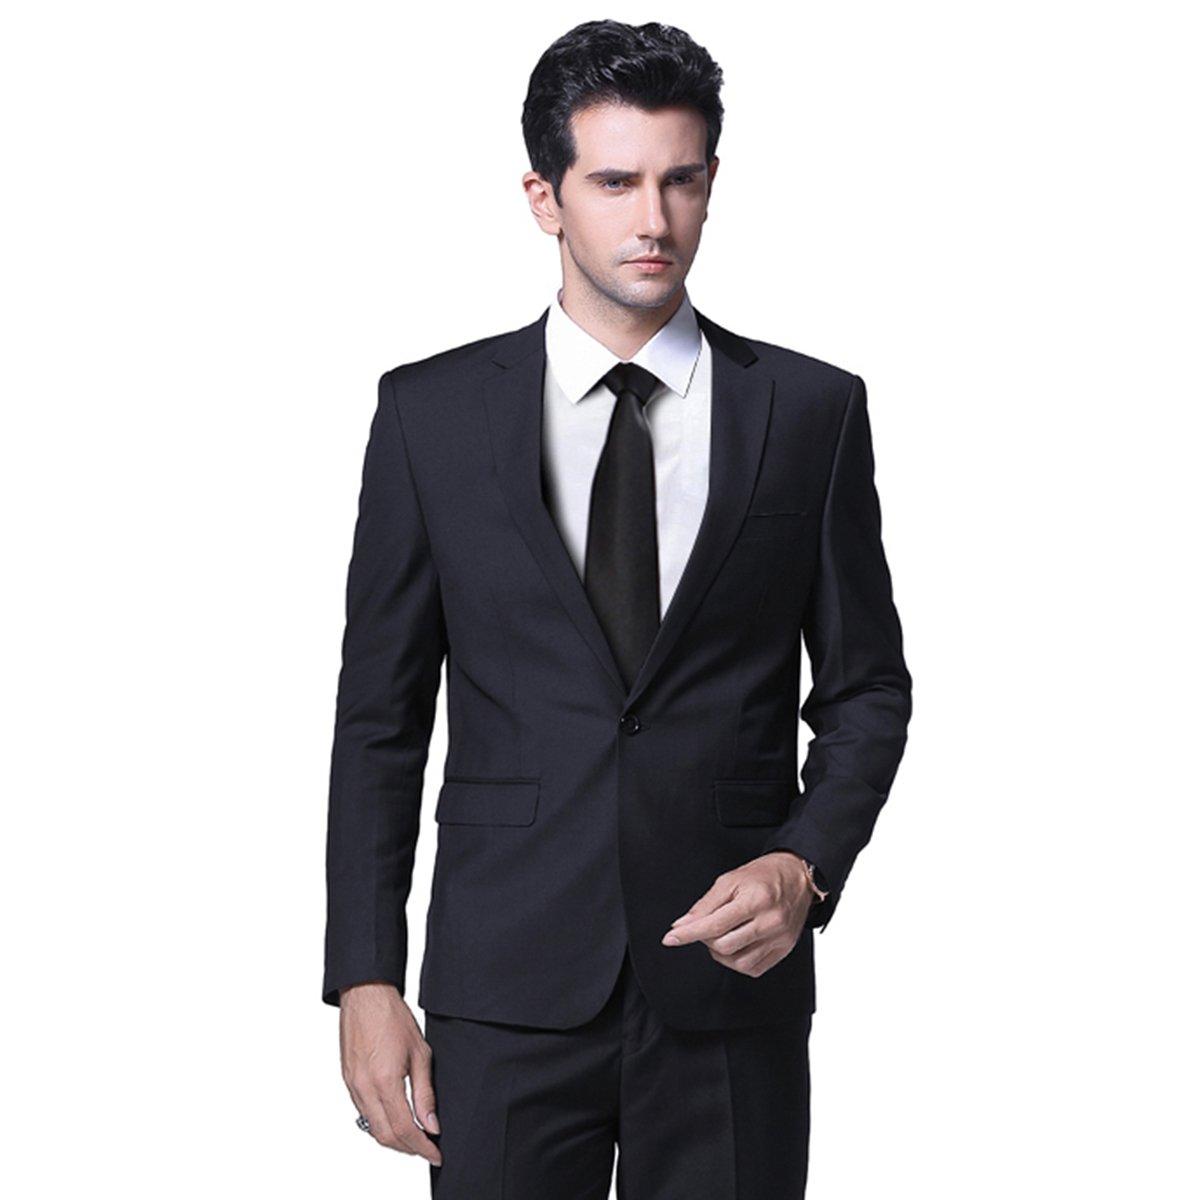 Mens One Button Formal 2 Piece Suits Slim Fit Multi-Color Wedding Tuxedo